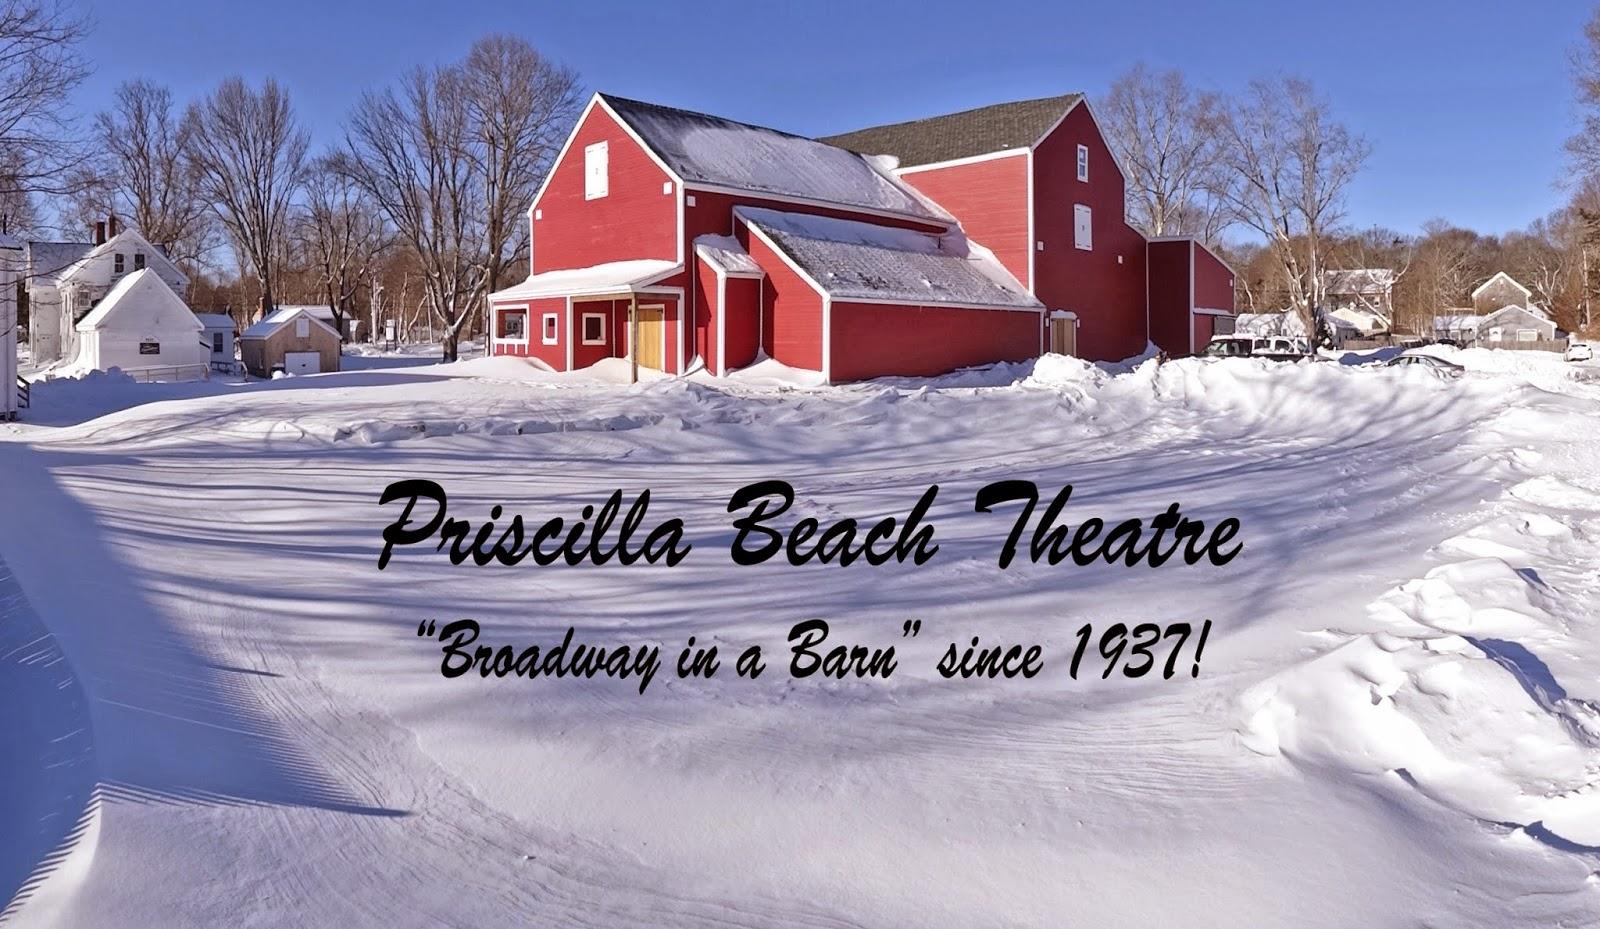 Joe S Retirement Blog Priscilla Beach Theatre Restoration